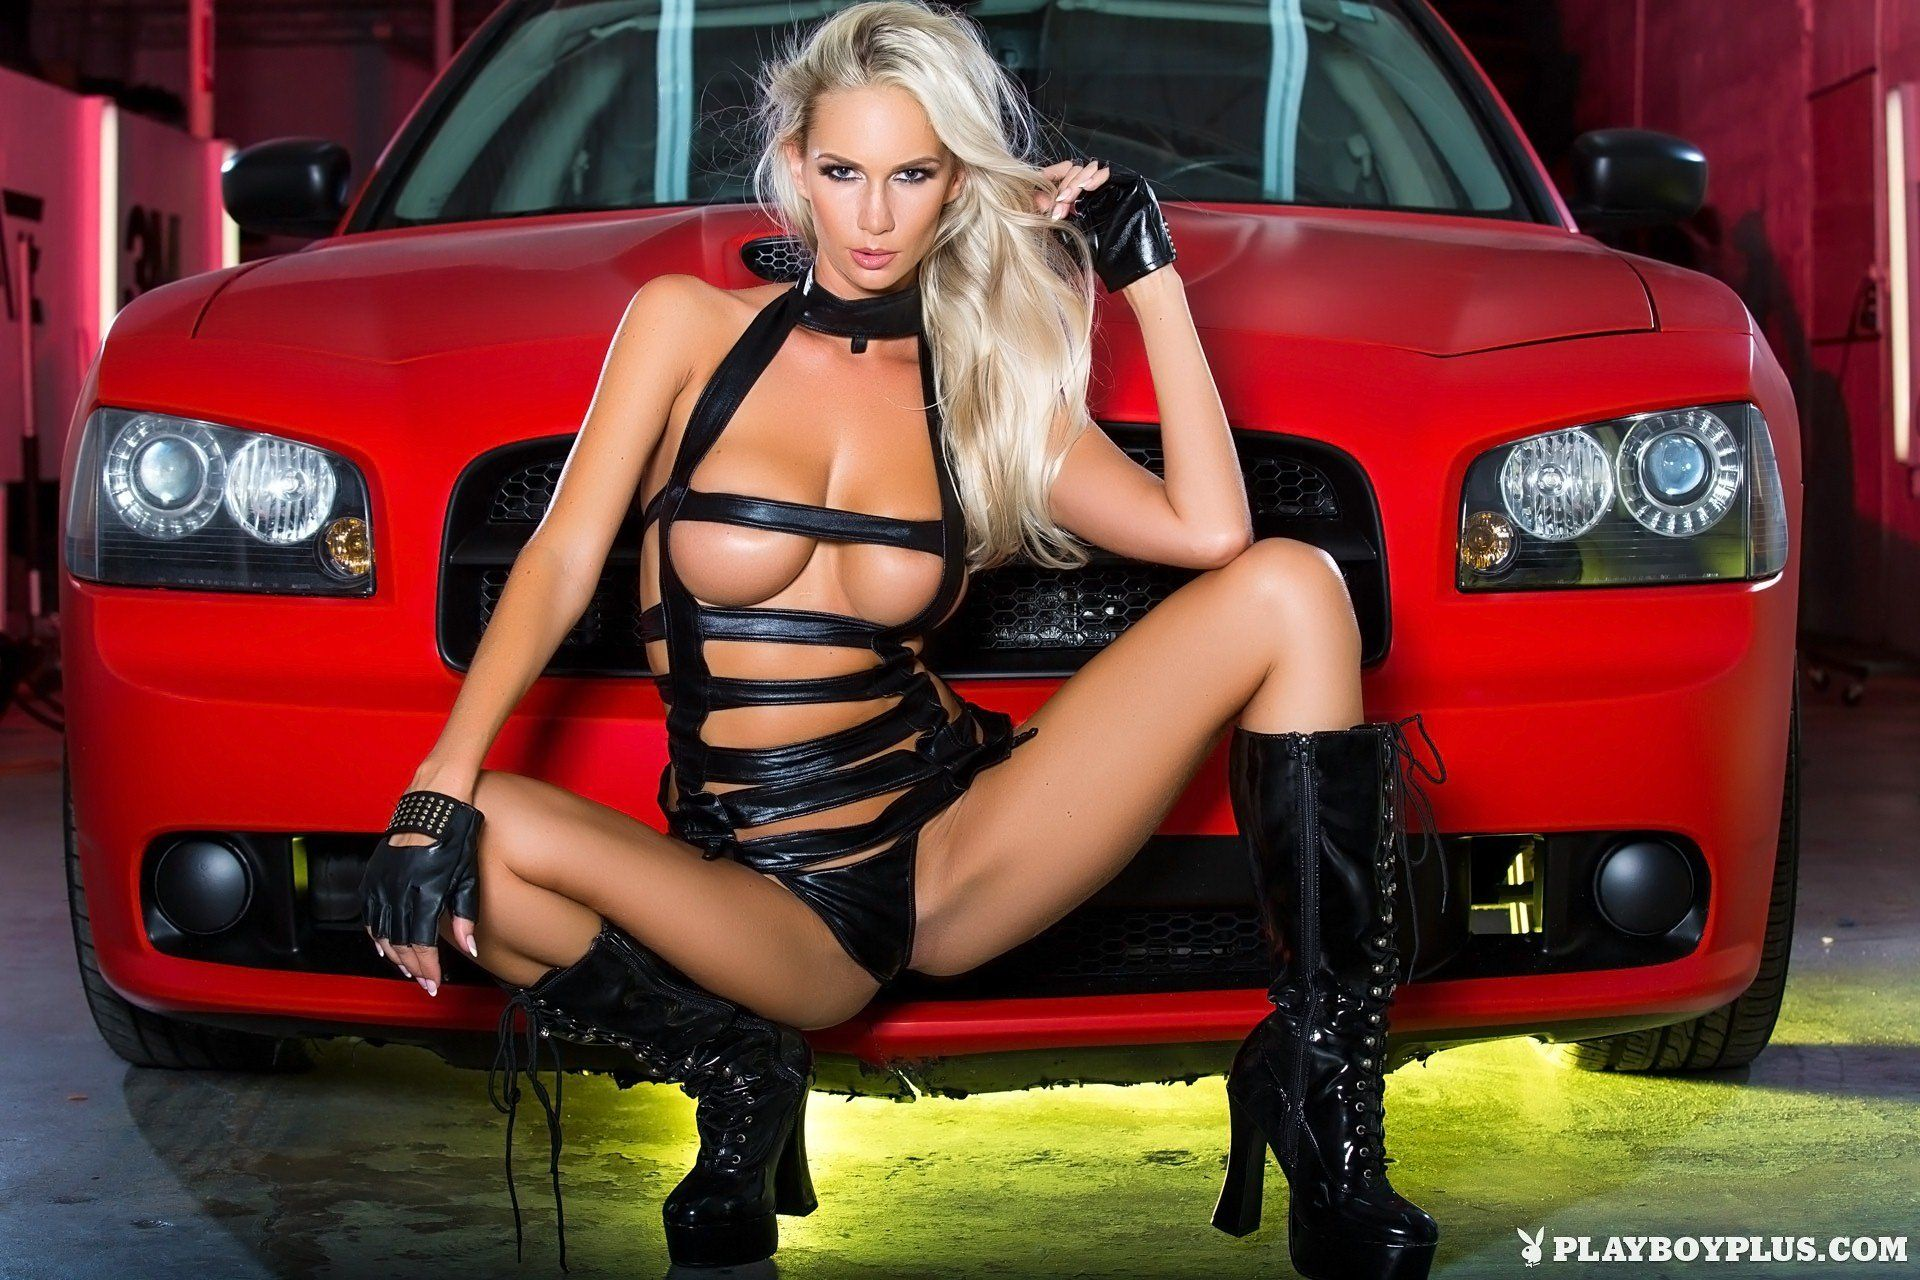 Nude pics of female porn star kristina rose